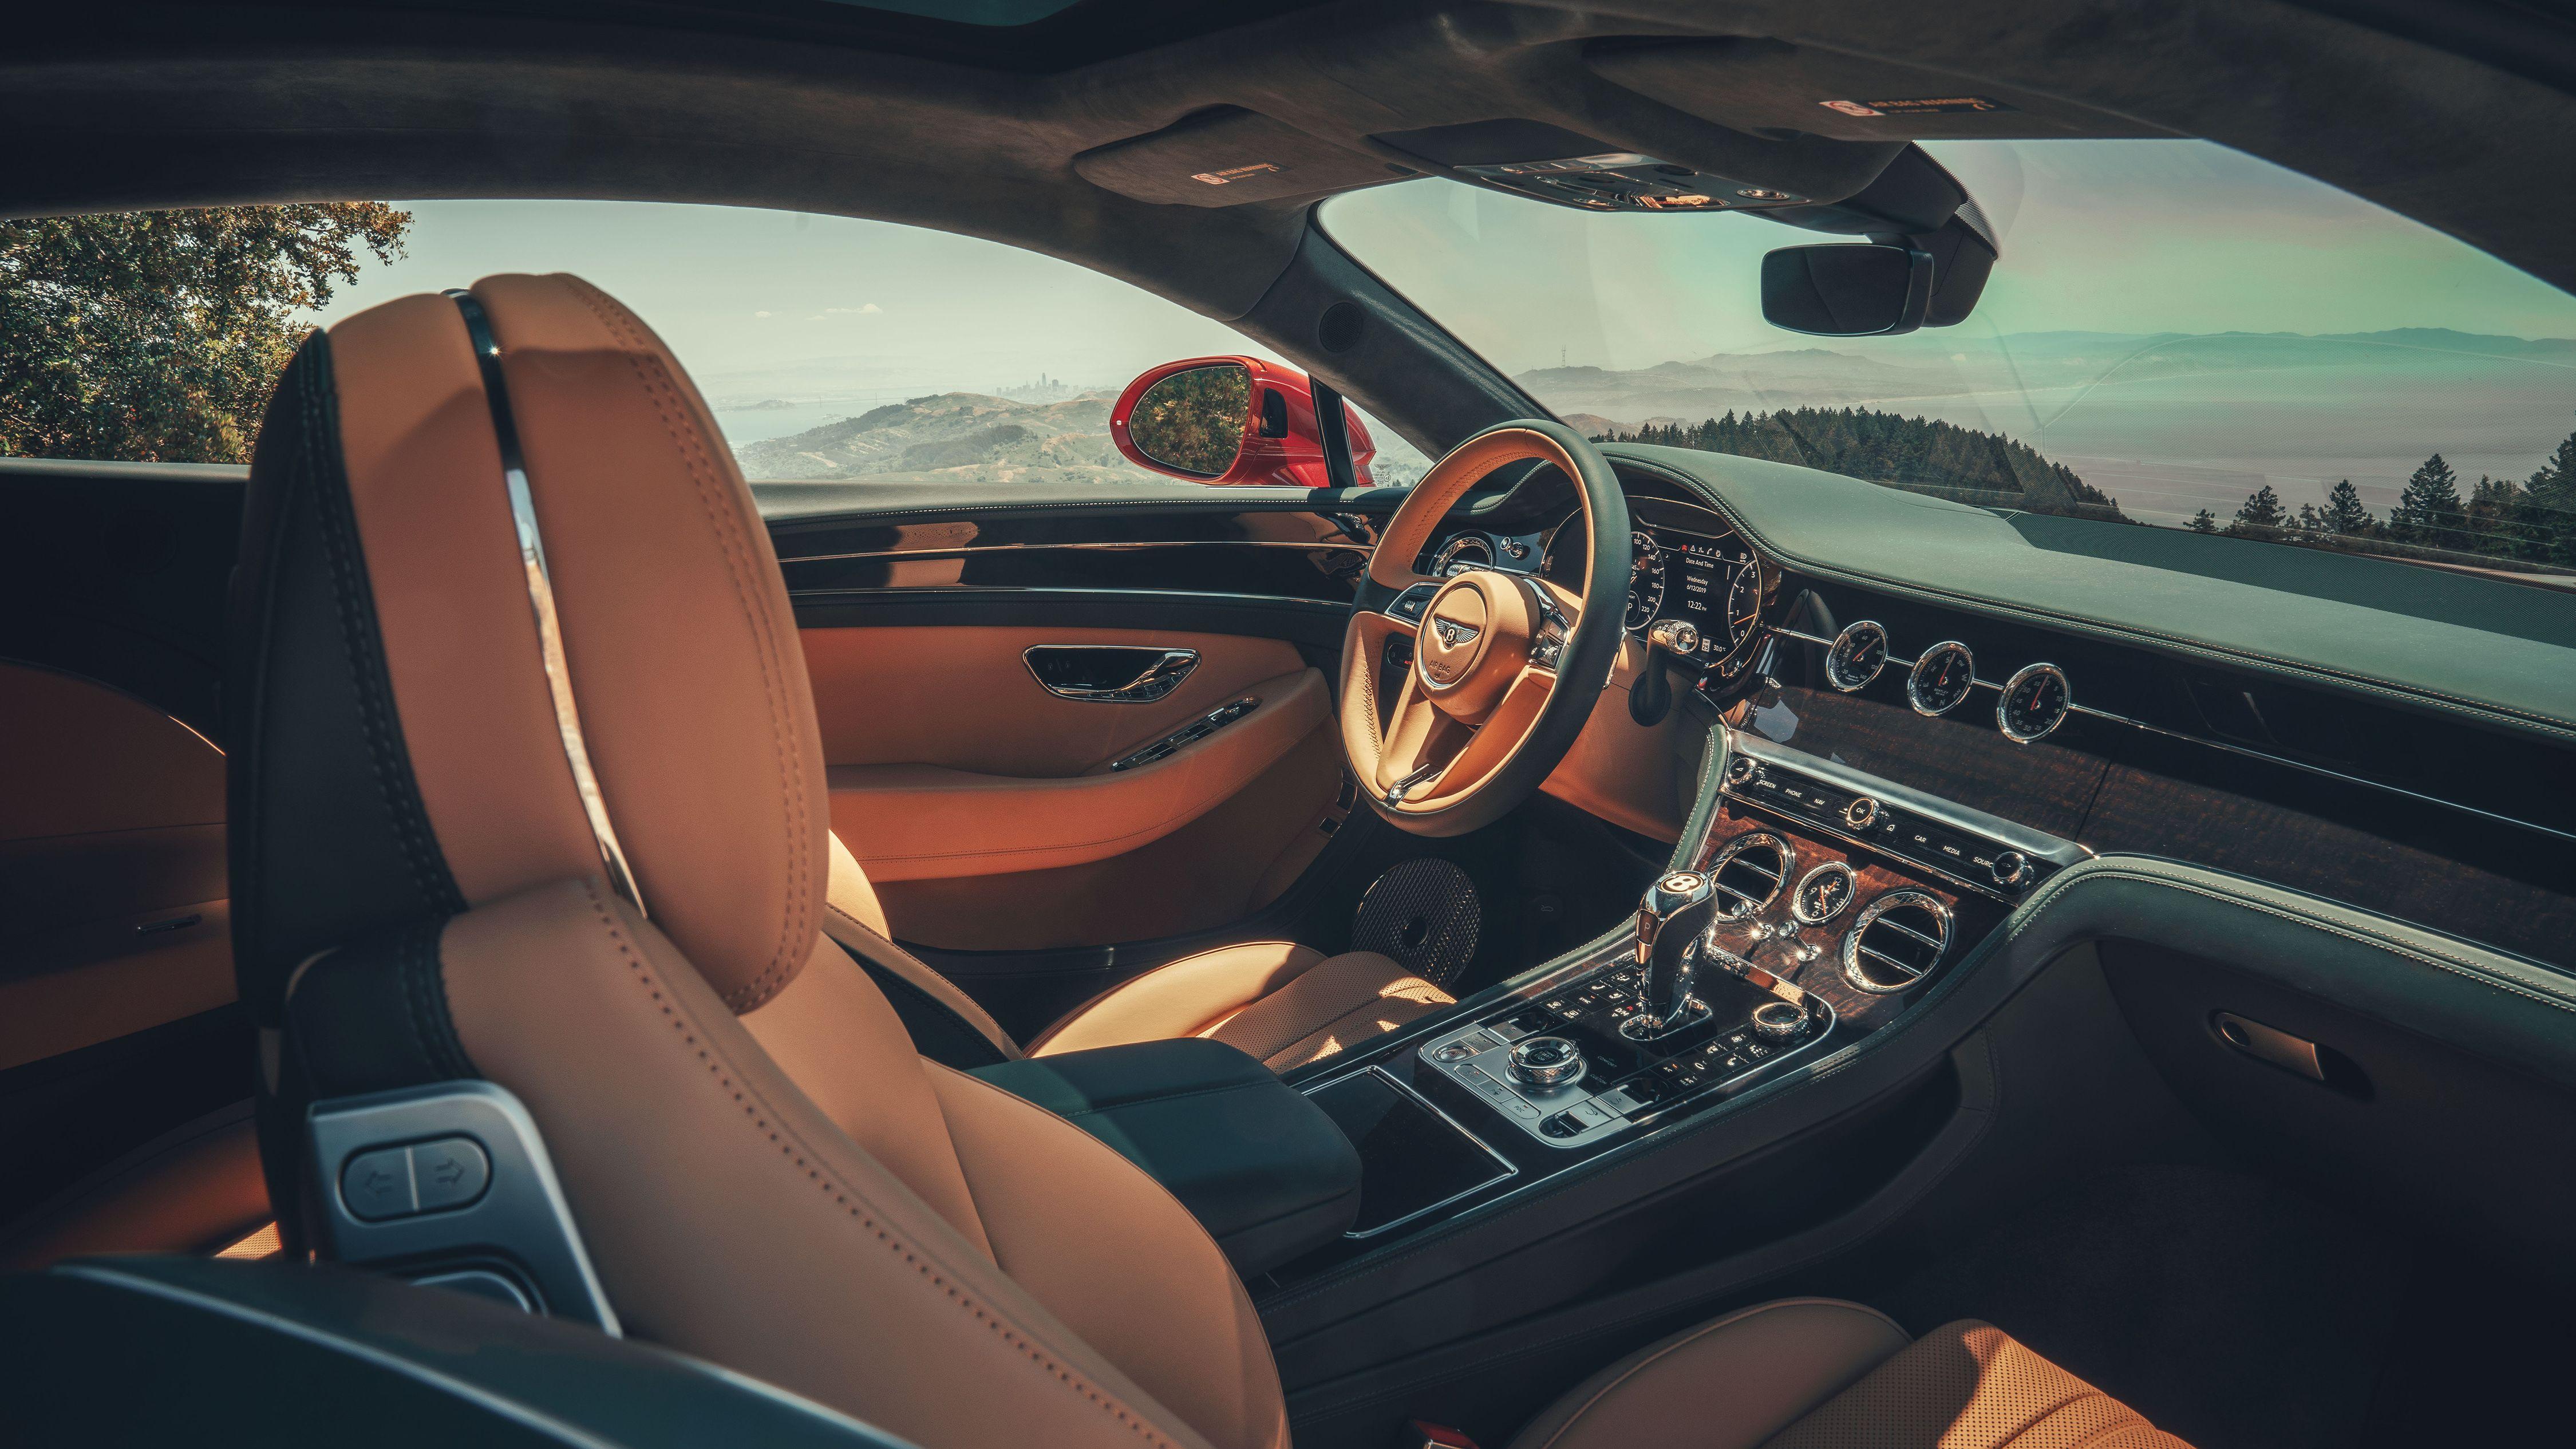 Bentley Continental Gt V8 2019 Bentley Continental Gt Best Car Interior Best New Cars